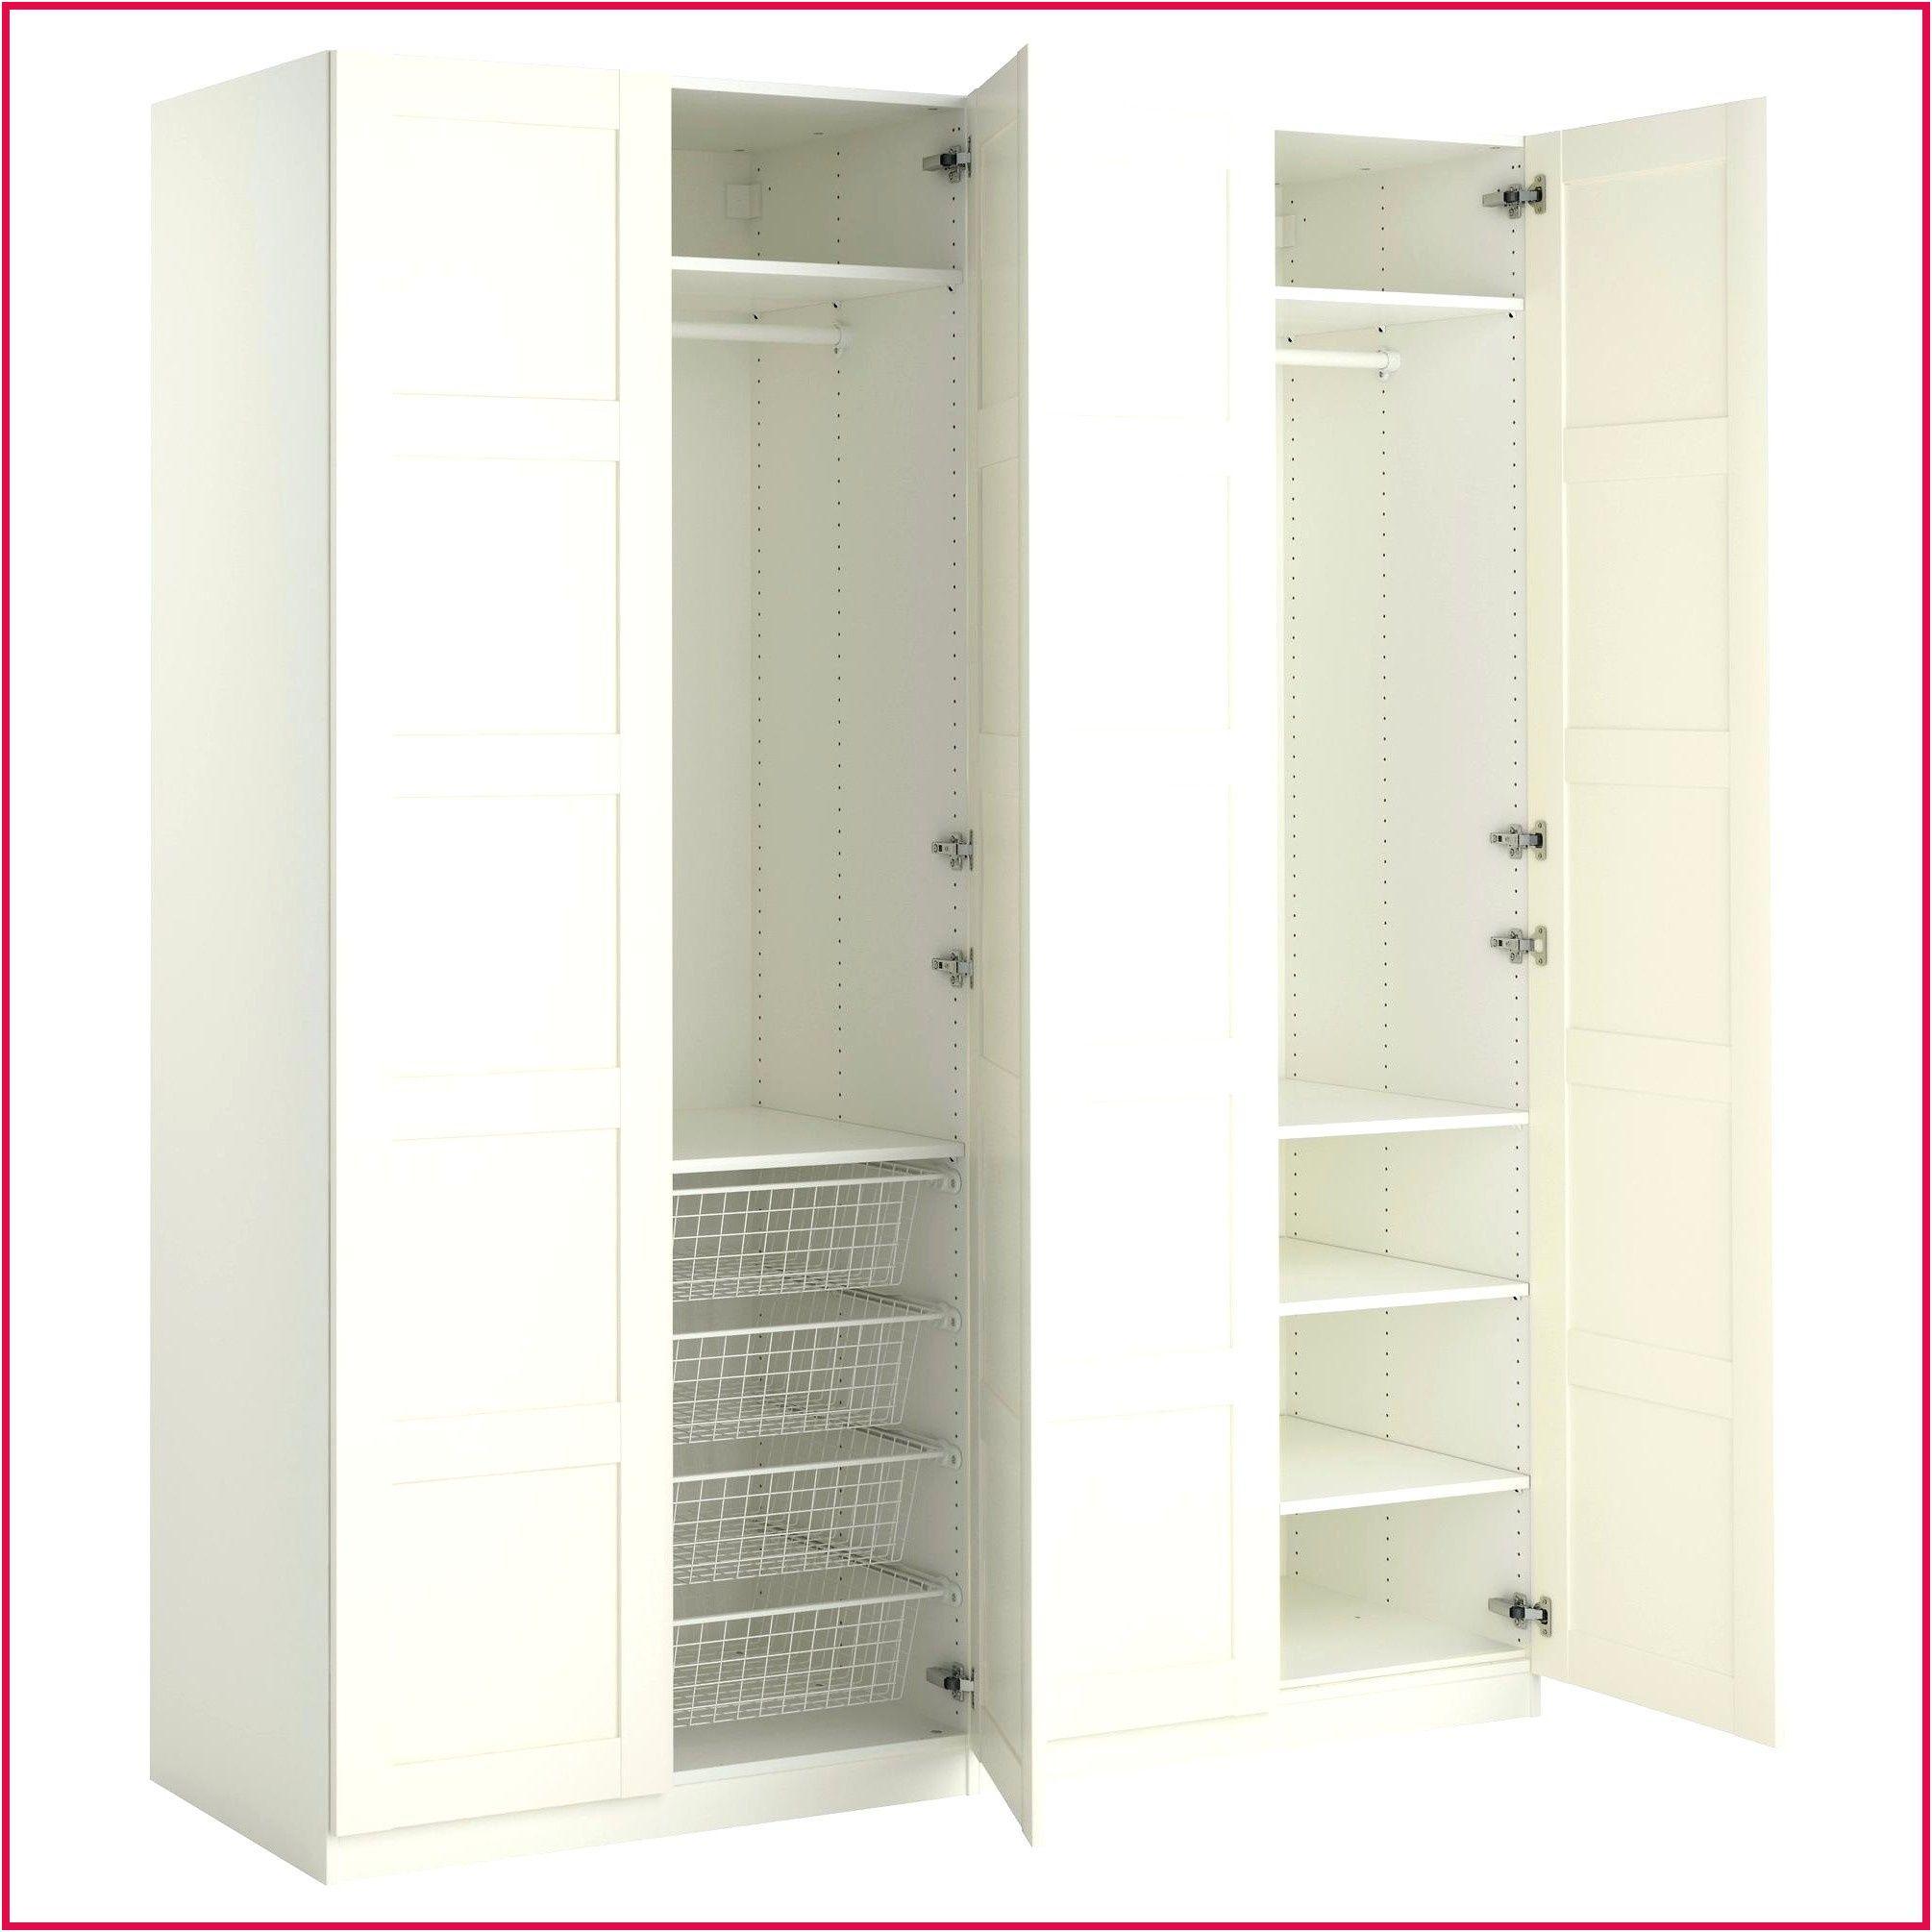 13 Aimable Ikea Armoire Metallique Armoire Ikea Armoire Metallique Armoire Rangement